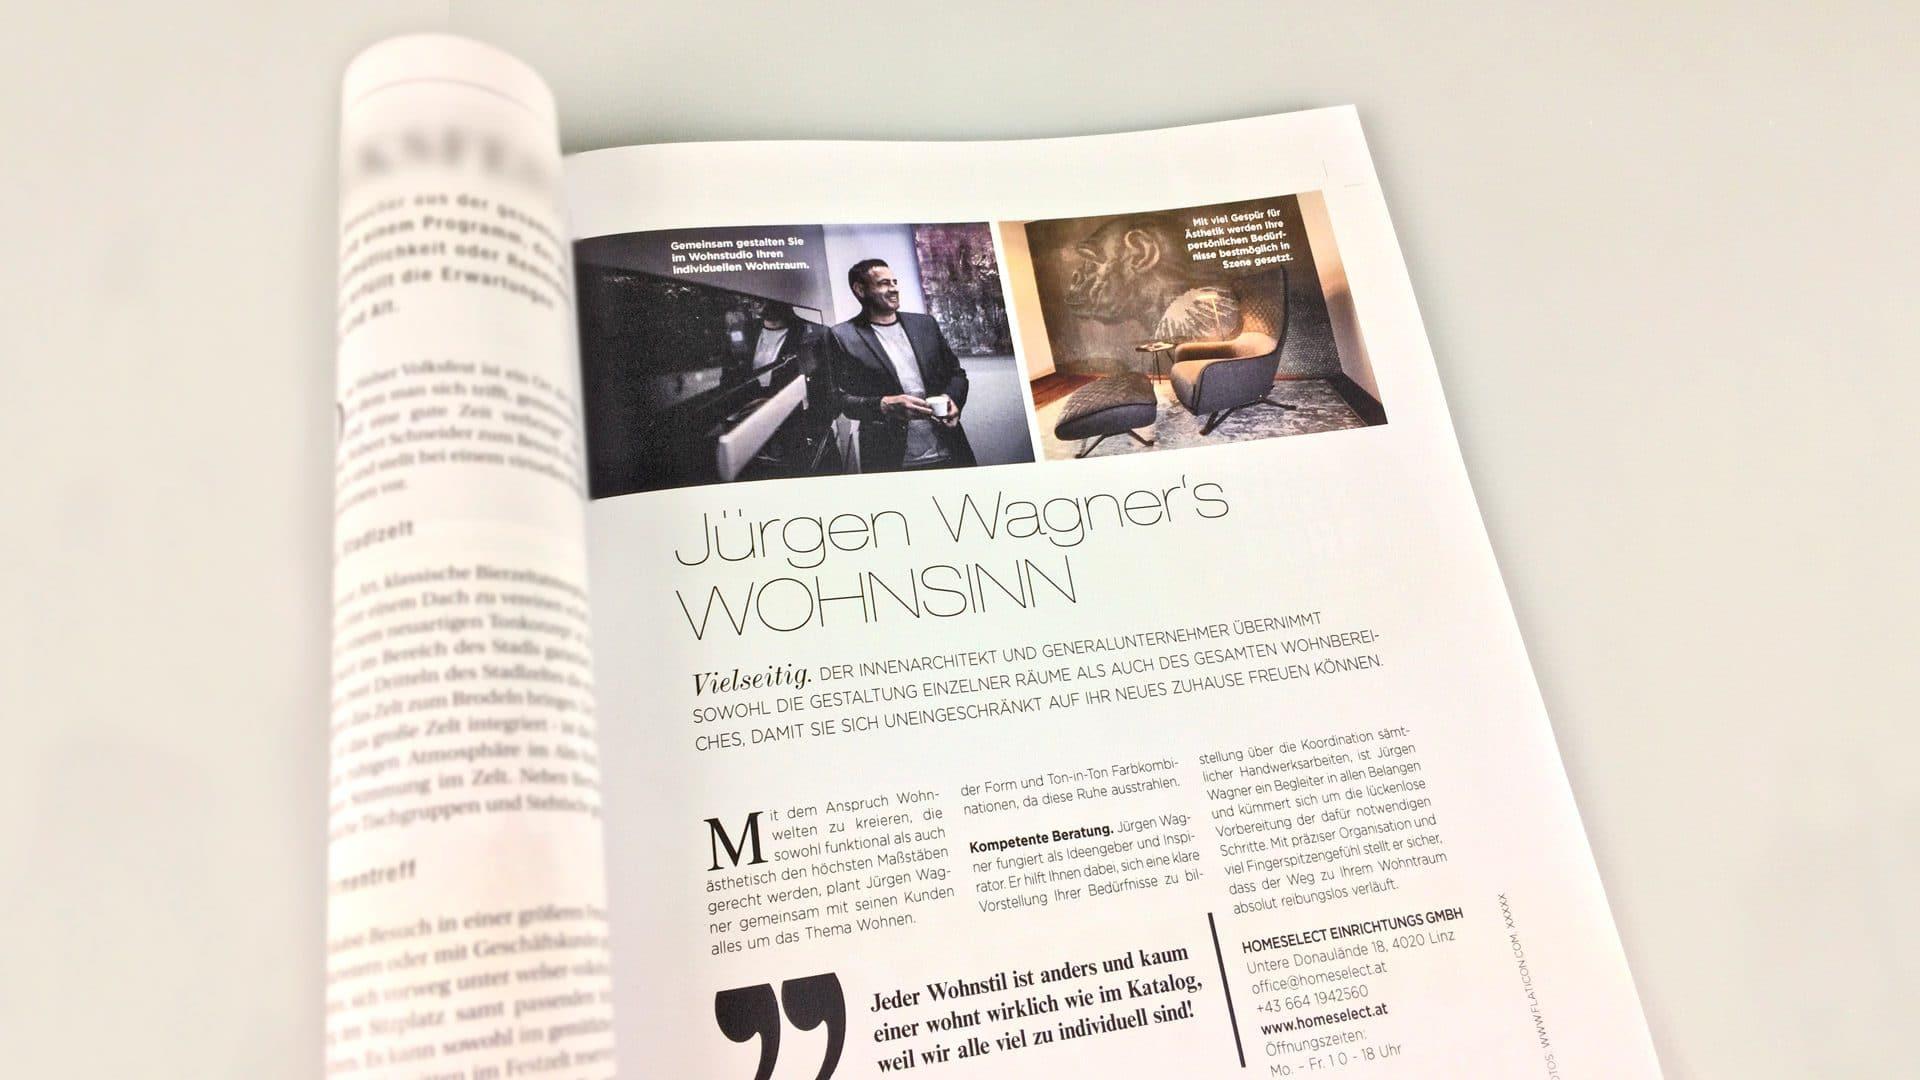 Jürgen Wagners Wohnsinn Beitrag Im Lifestyle Magazin Moments